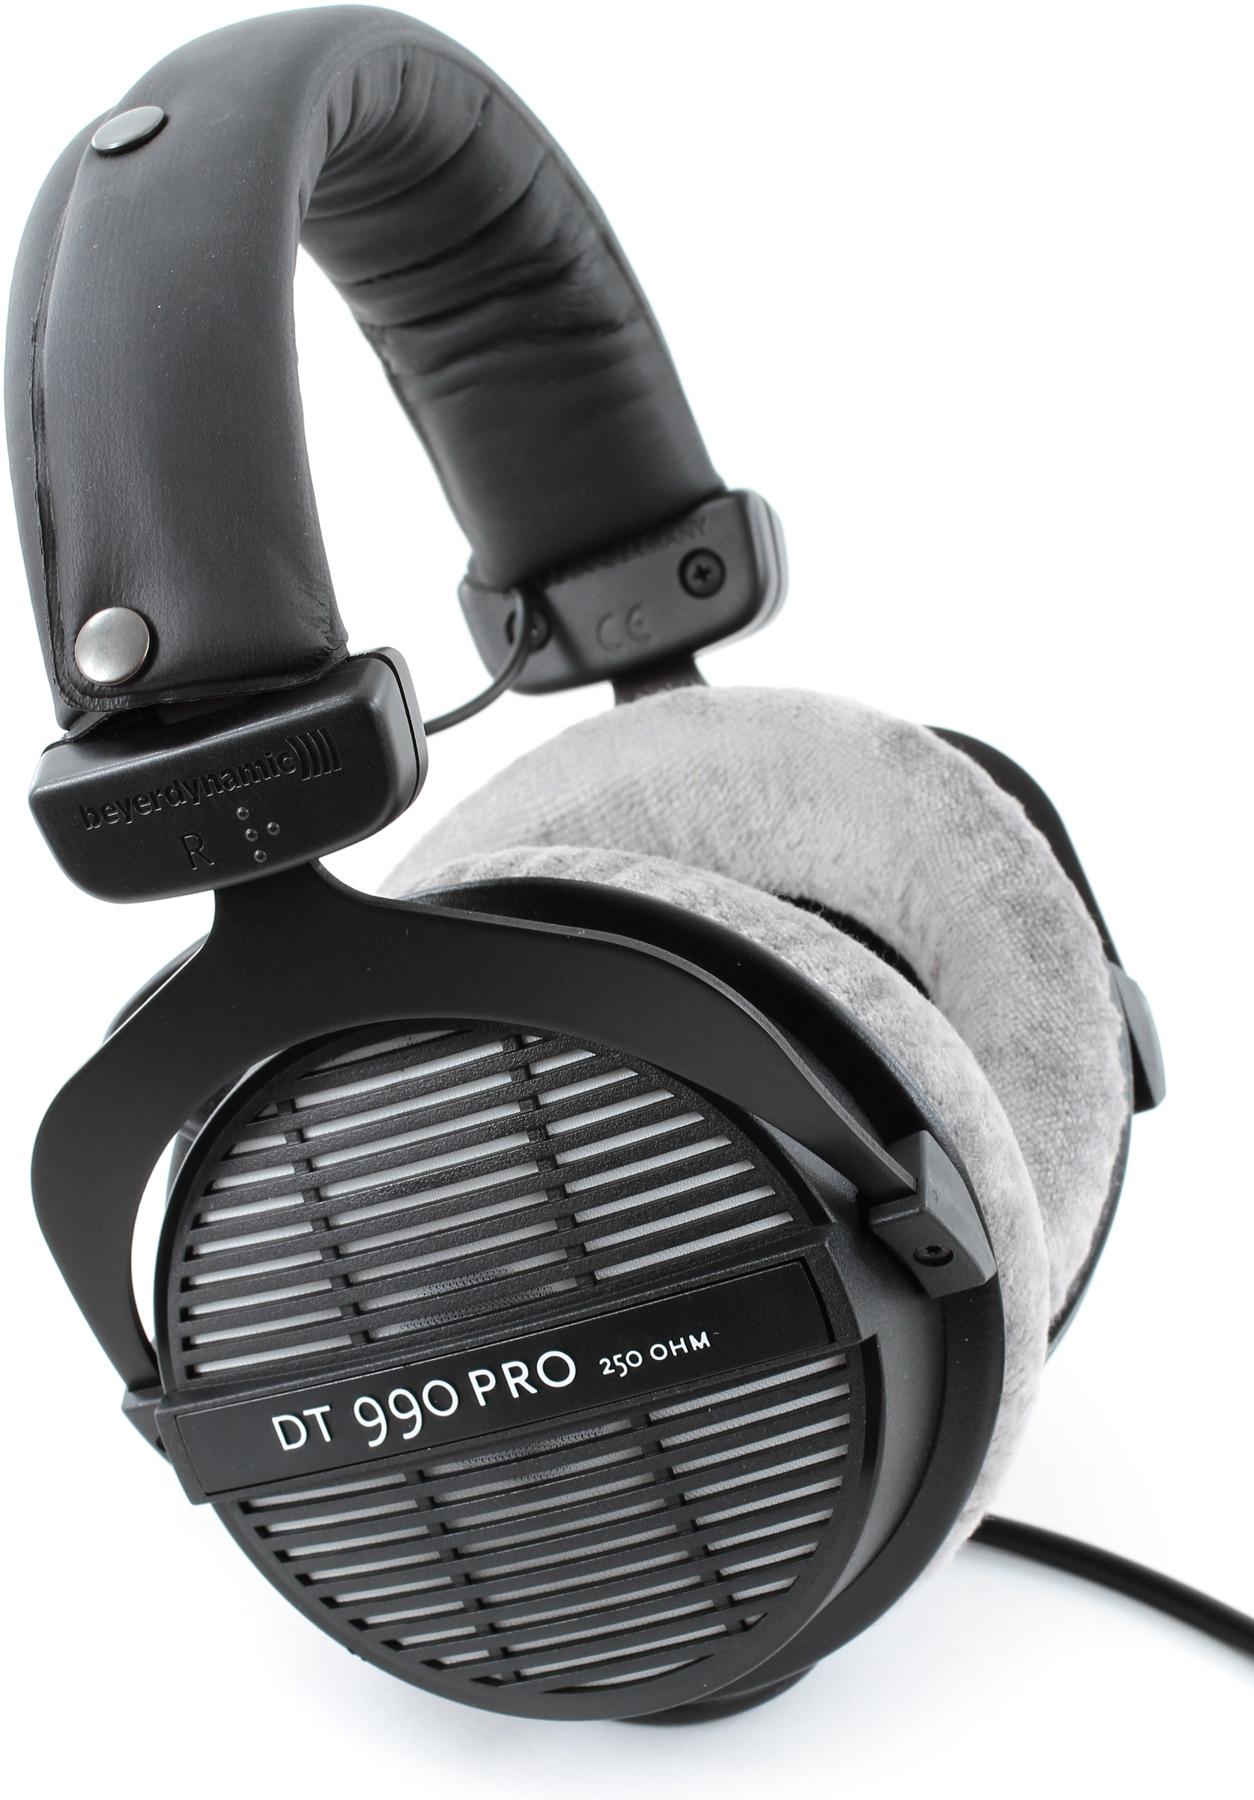 beyerdynamic dt 990 pro headphones headphone reviews and discussion head. Black Bedroom Furniture Sets. Home Design Ideas